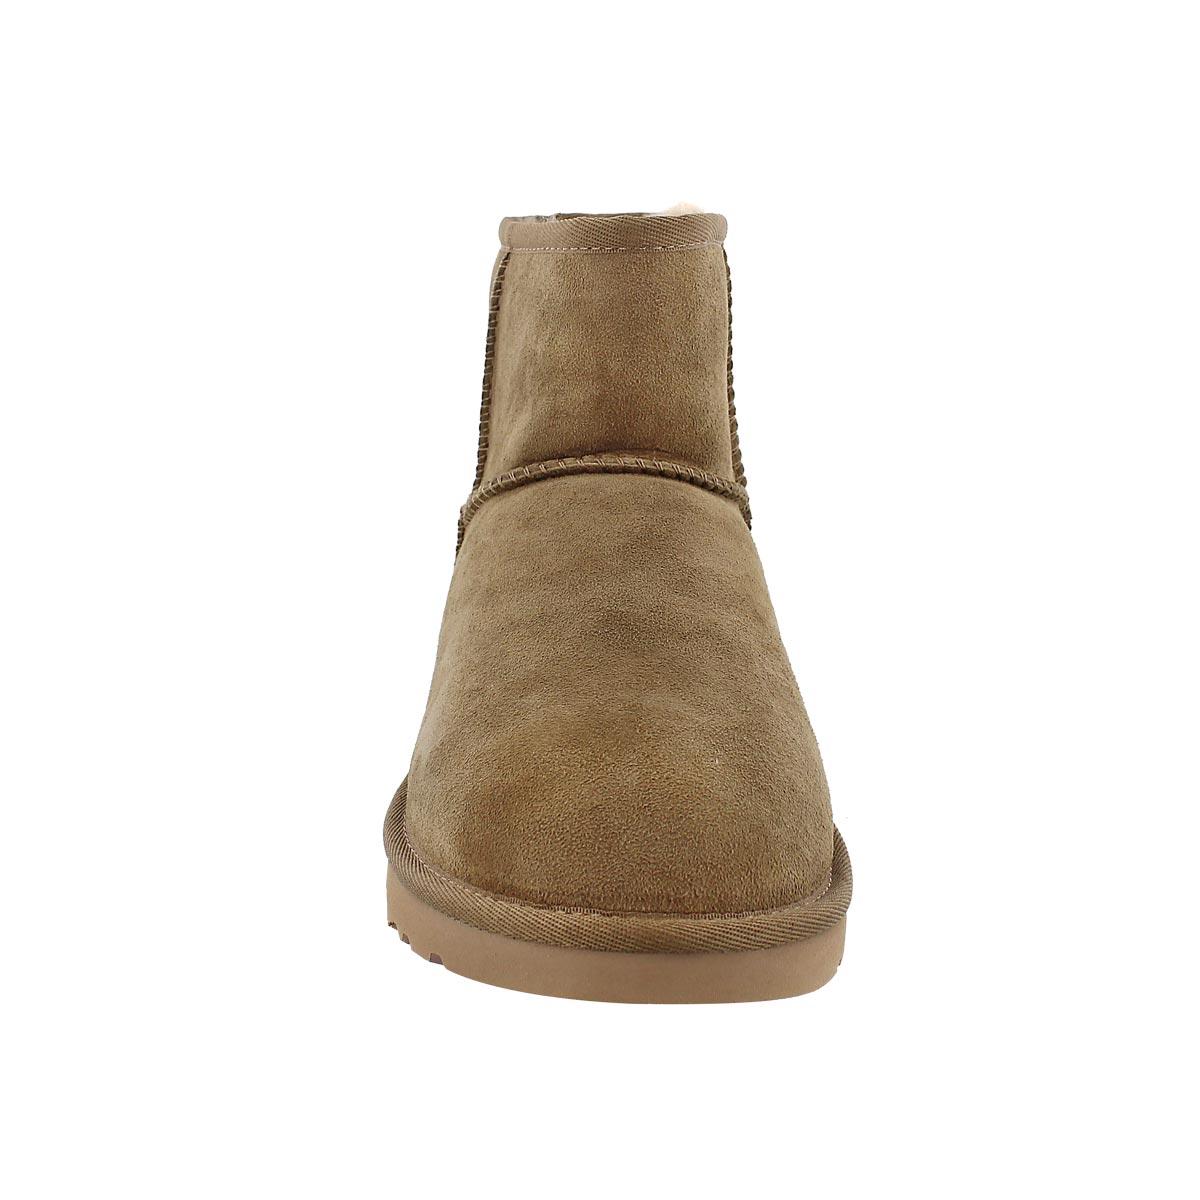 Lds Classic Mini dry leaf sheepskin boot